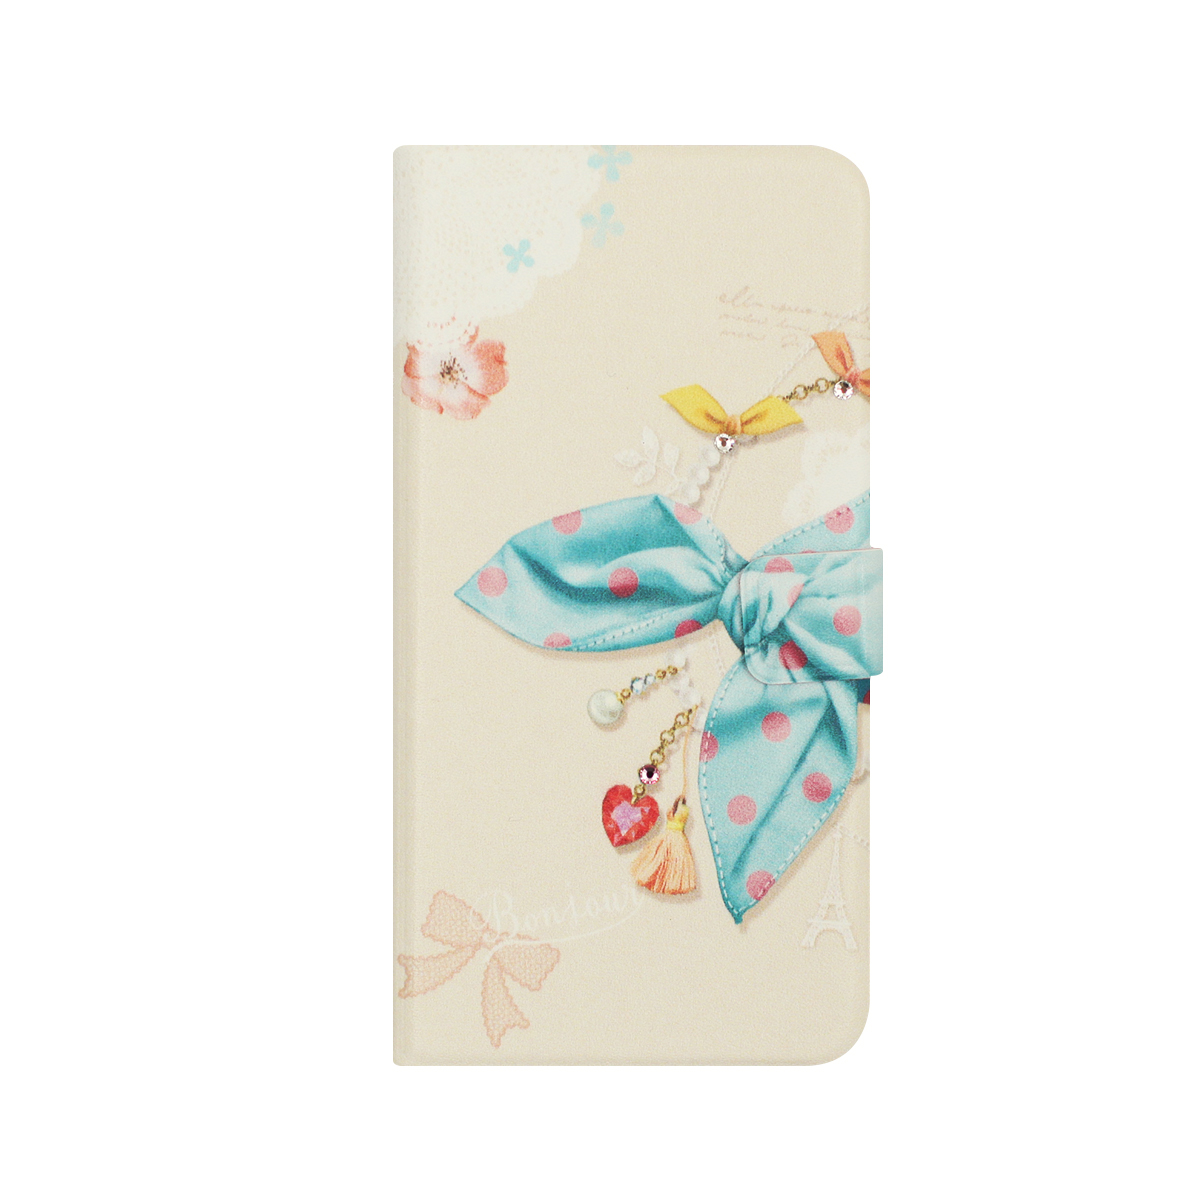 iPhone 8 / 7ケース 手帳型 Happymori Dot Scarf Diary(ハッピーモリ ドットスカーフダイアリー)アイフォン カバー